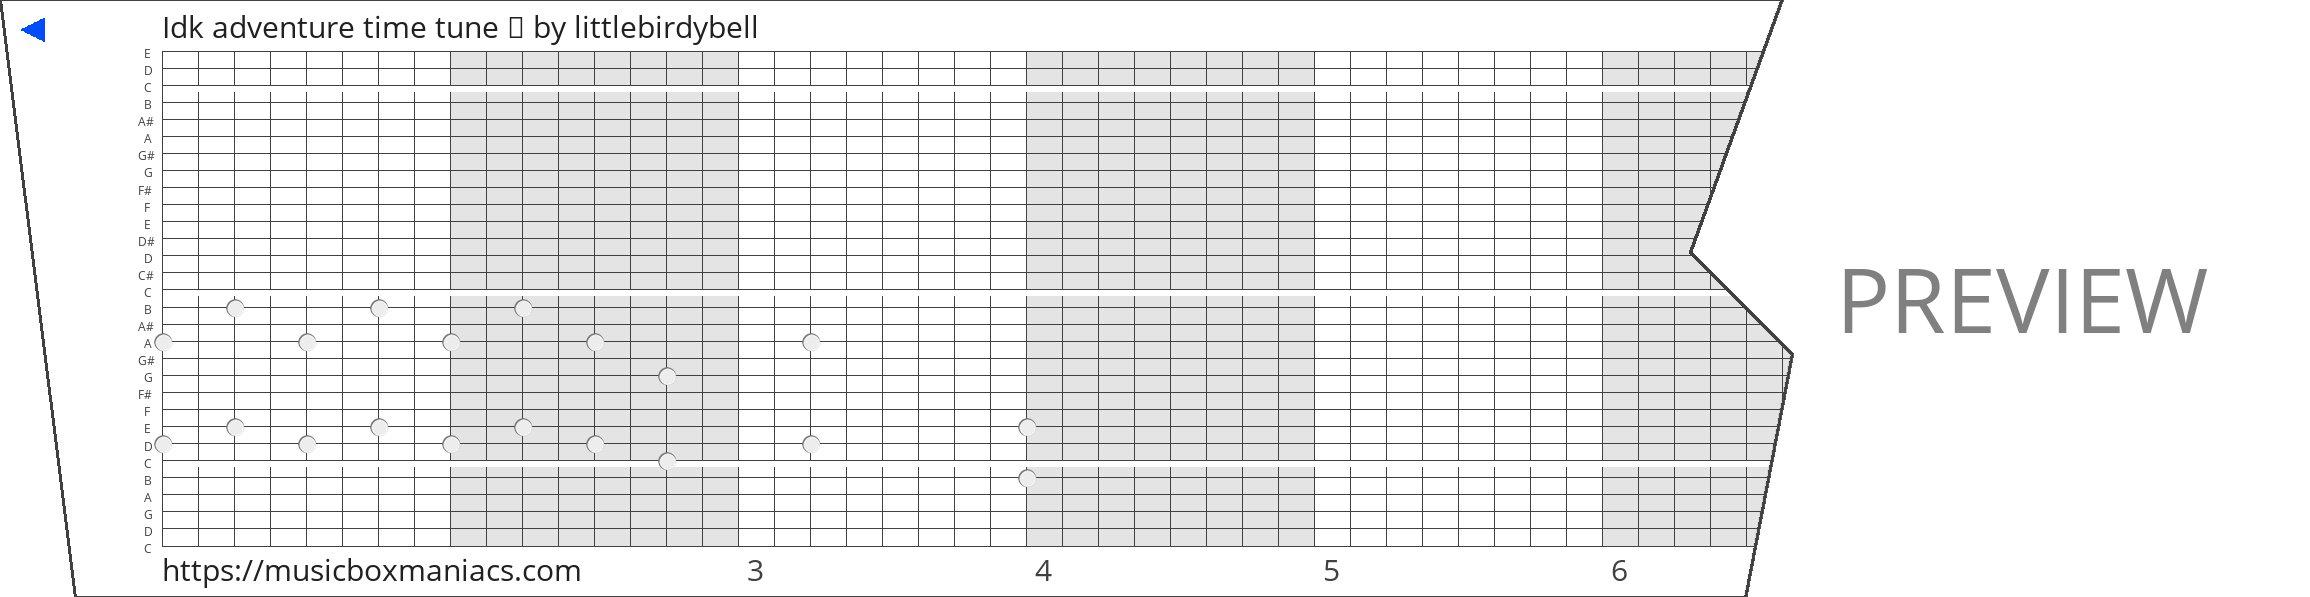 Idk adventure time tune 🙄 30 note music box paper strip